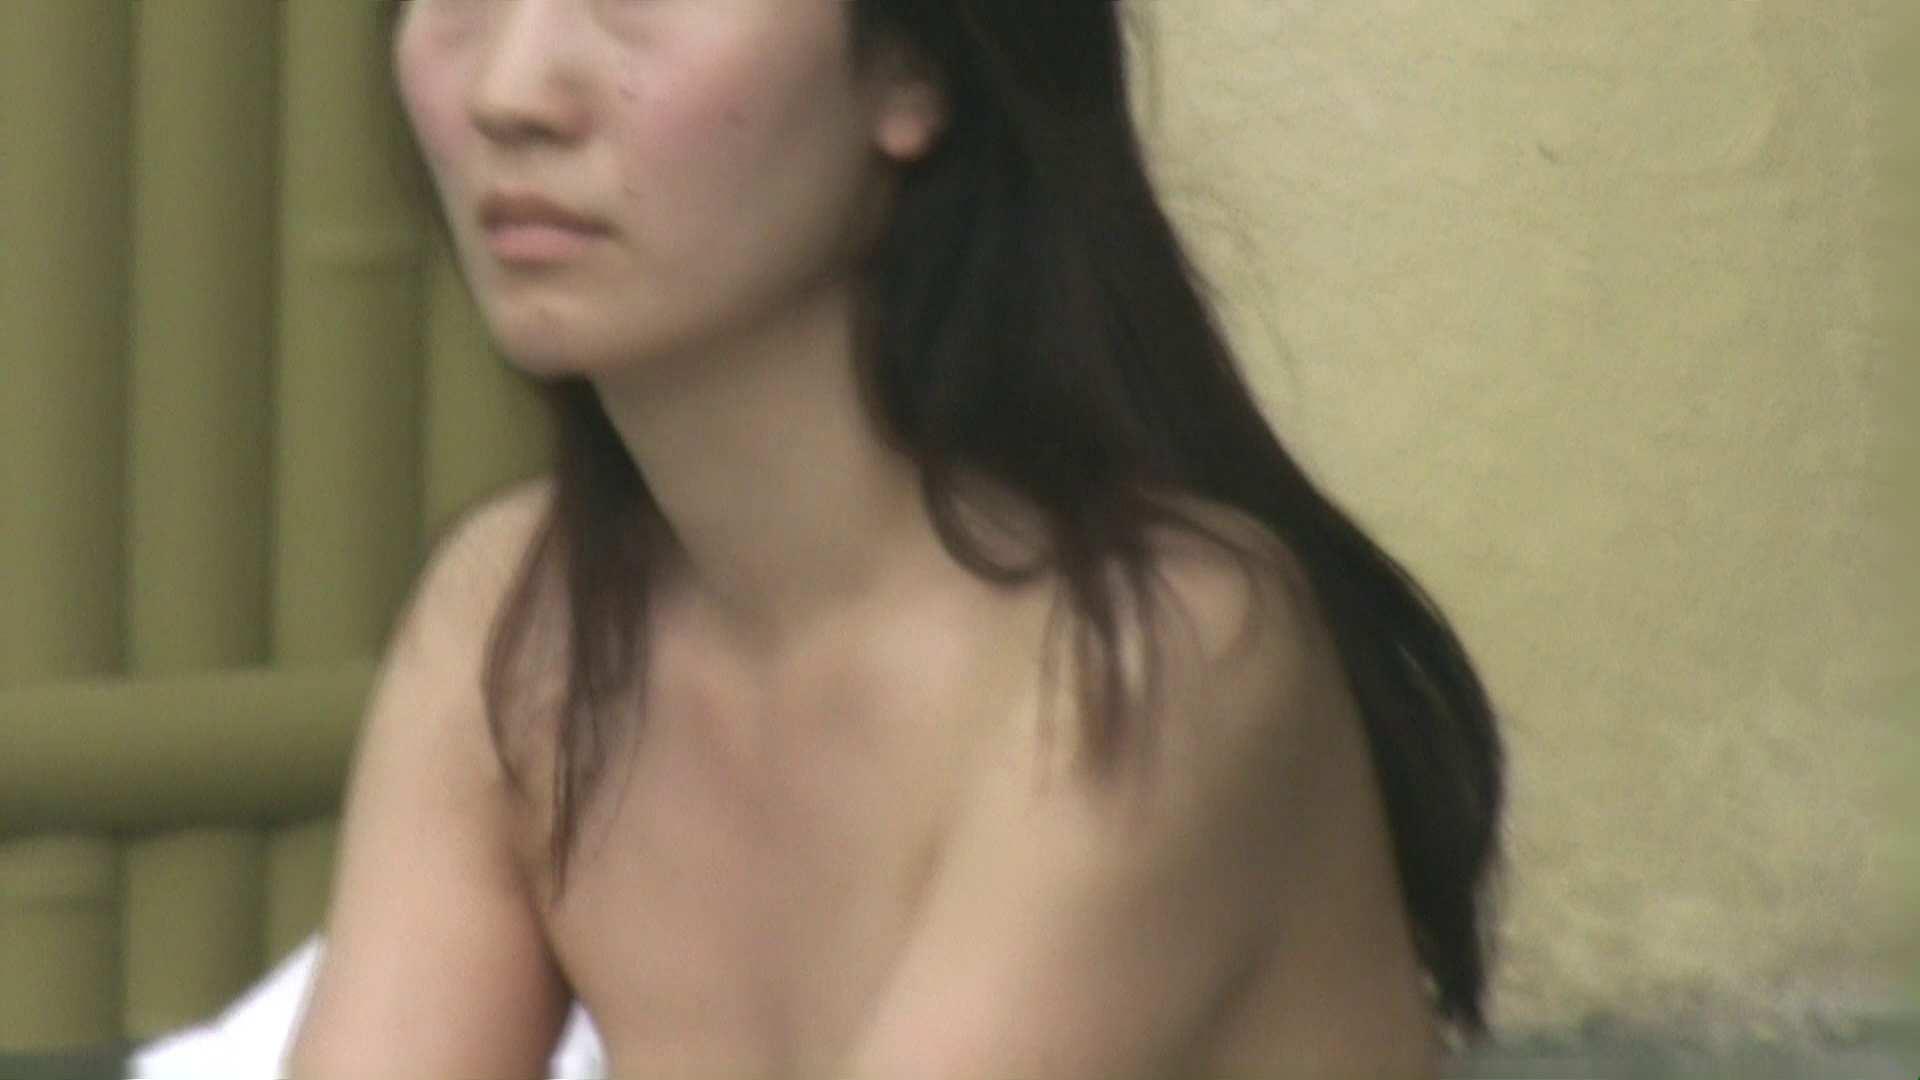 高画質露天女風呂観察 vol.034 望遠映像 AV無料動画キャプチャ 103PIX 17